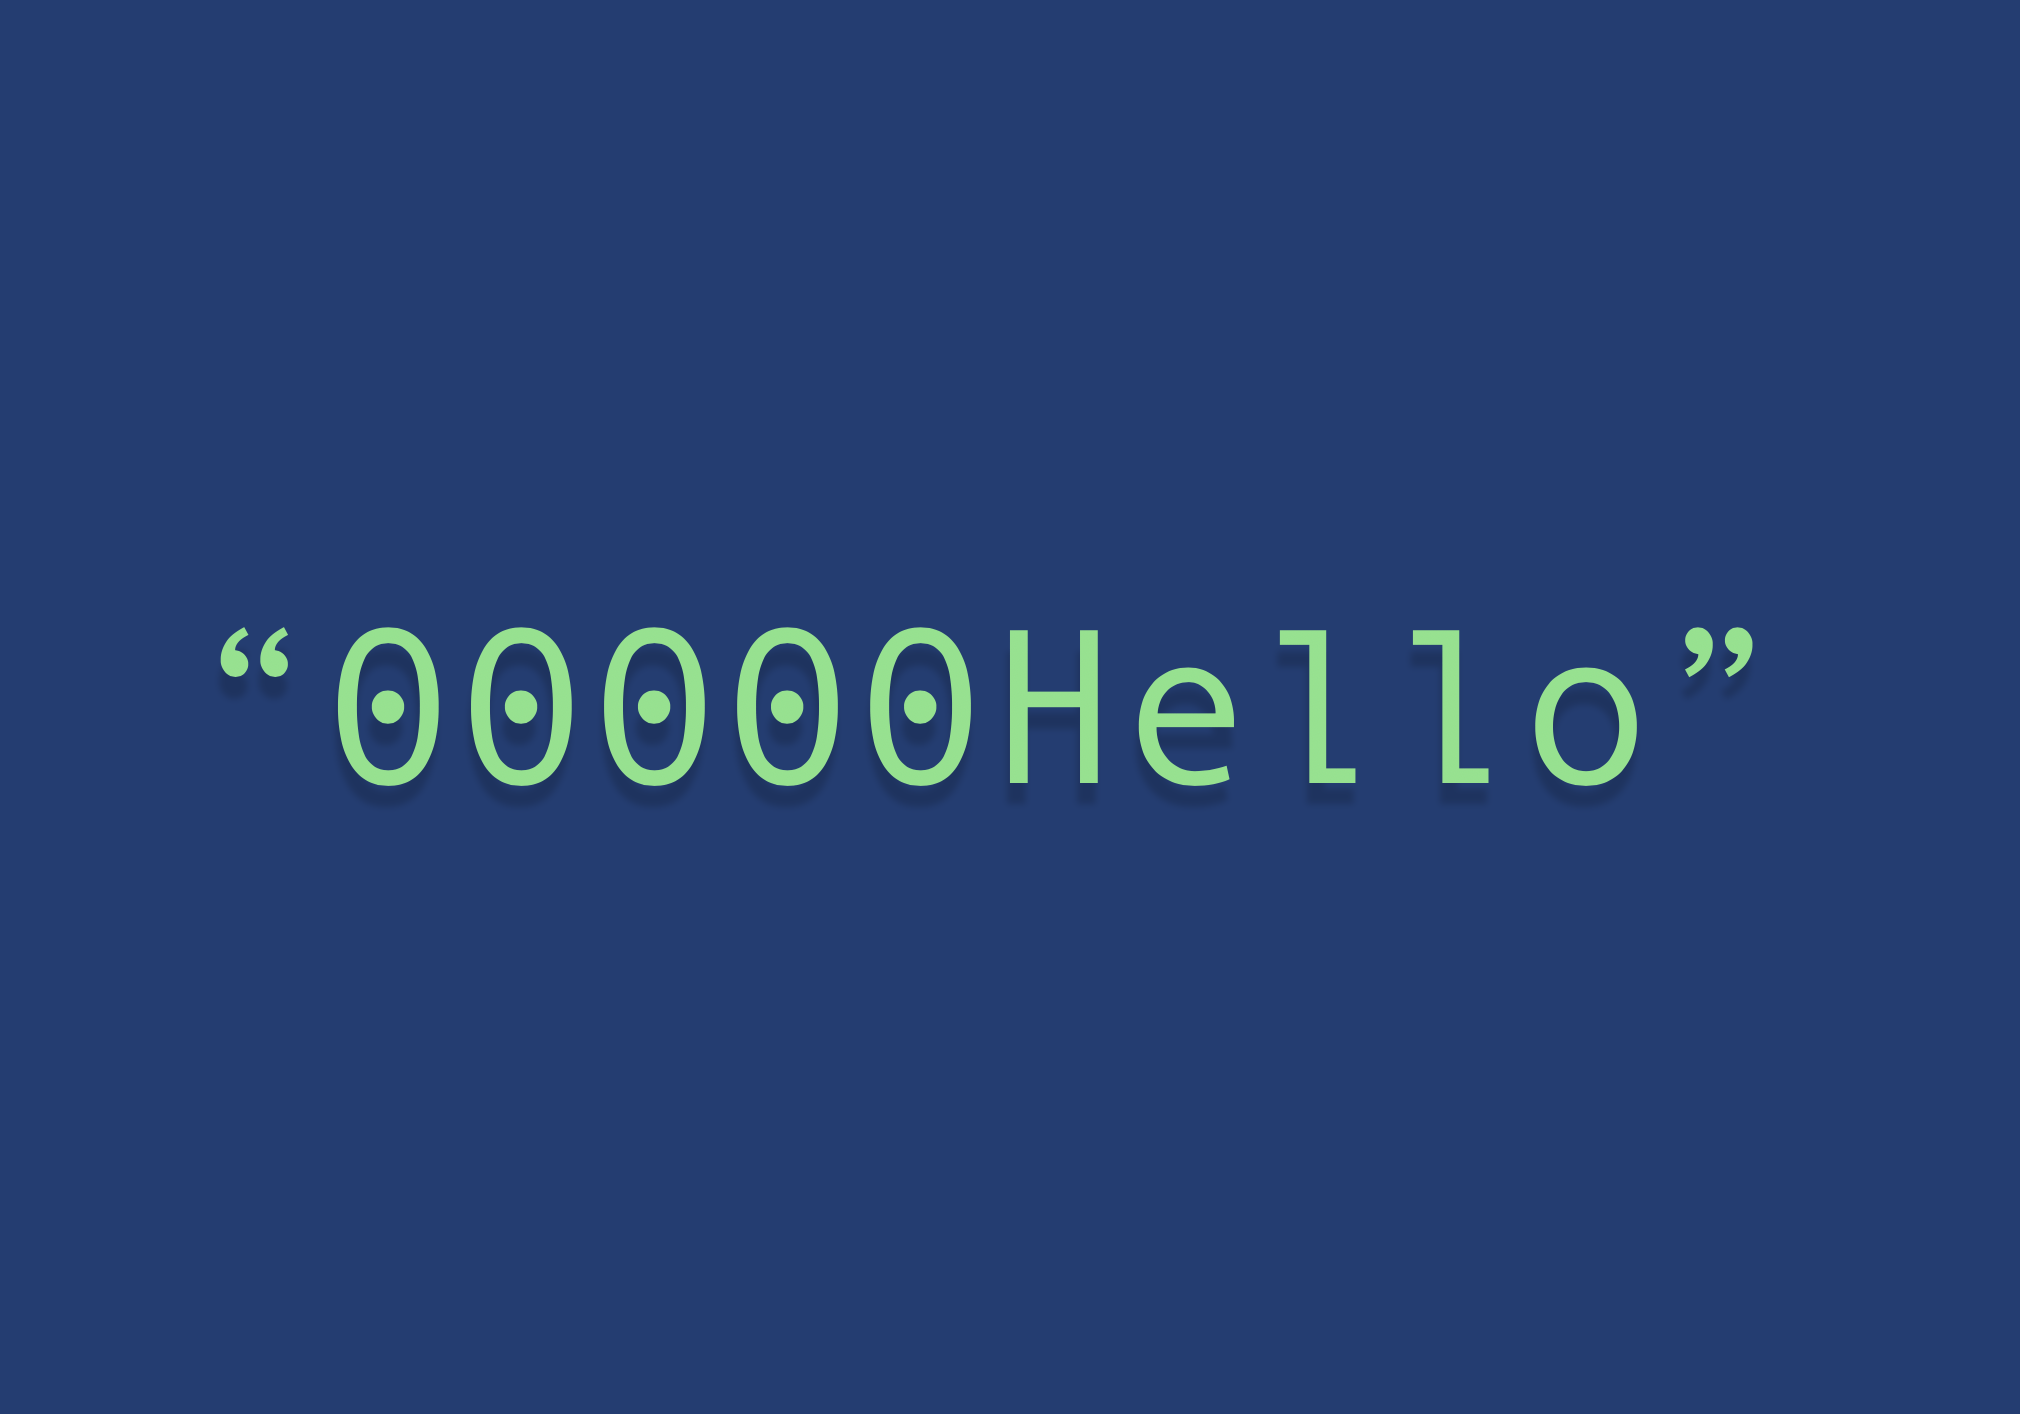 Python zfill method